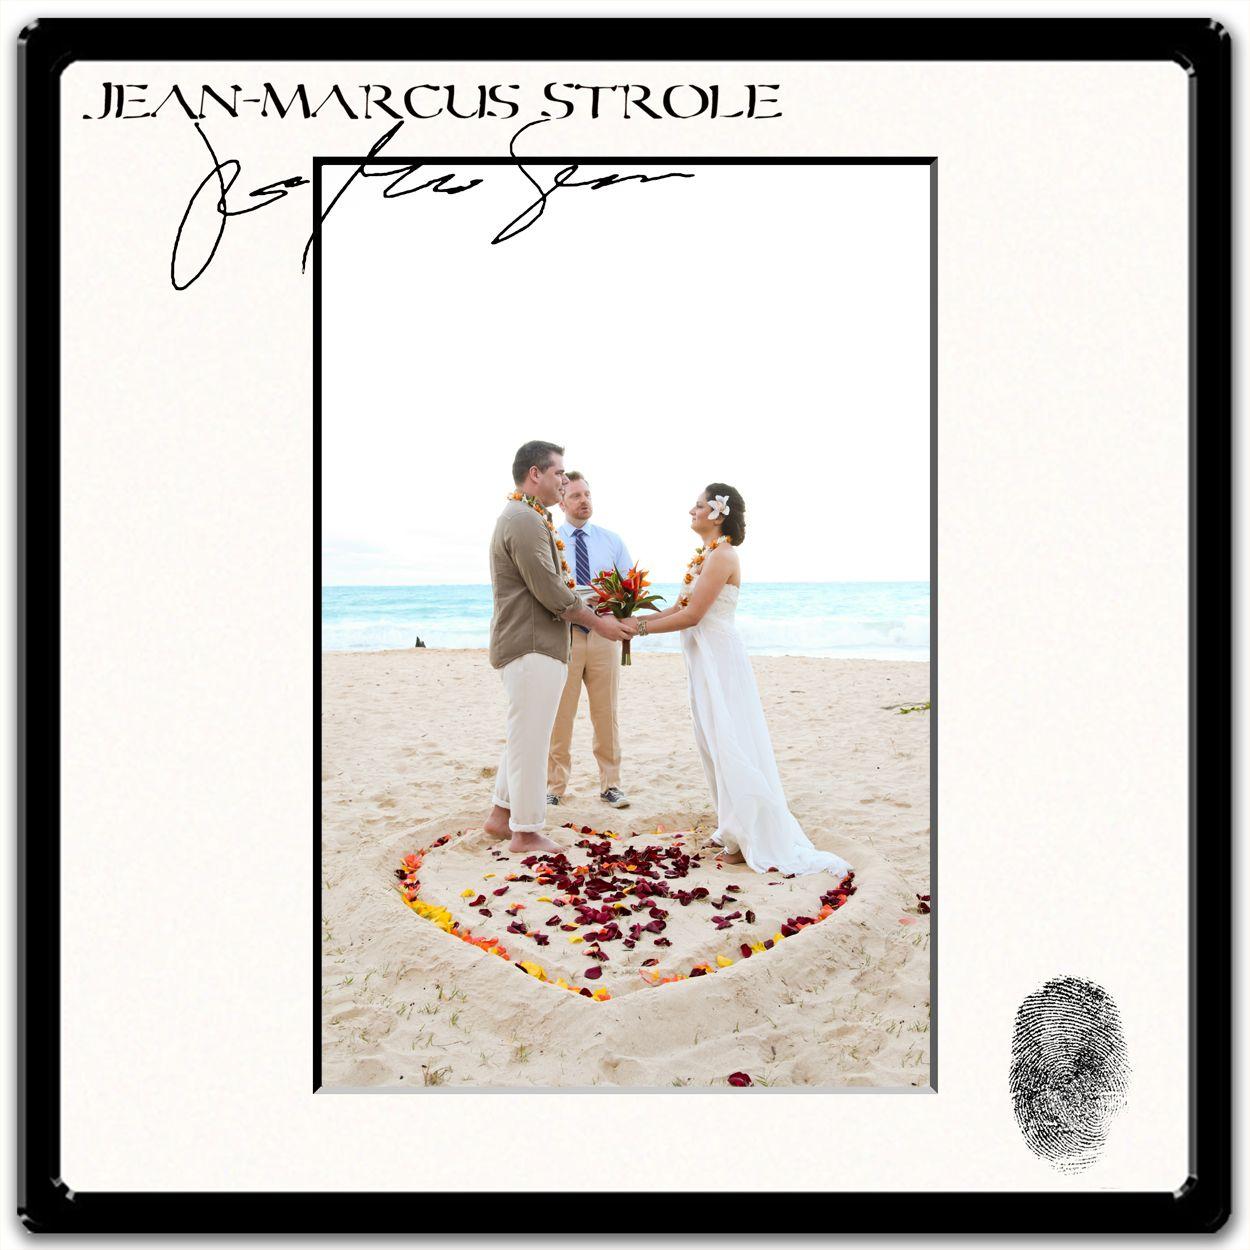 Waikiki Beach Wedding Ceremony: Bride & Groom Exchanging Wedding Vows Inside A Sand